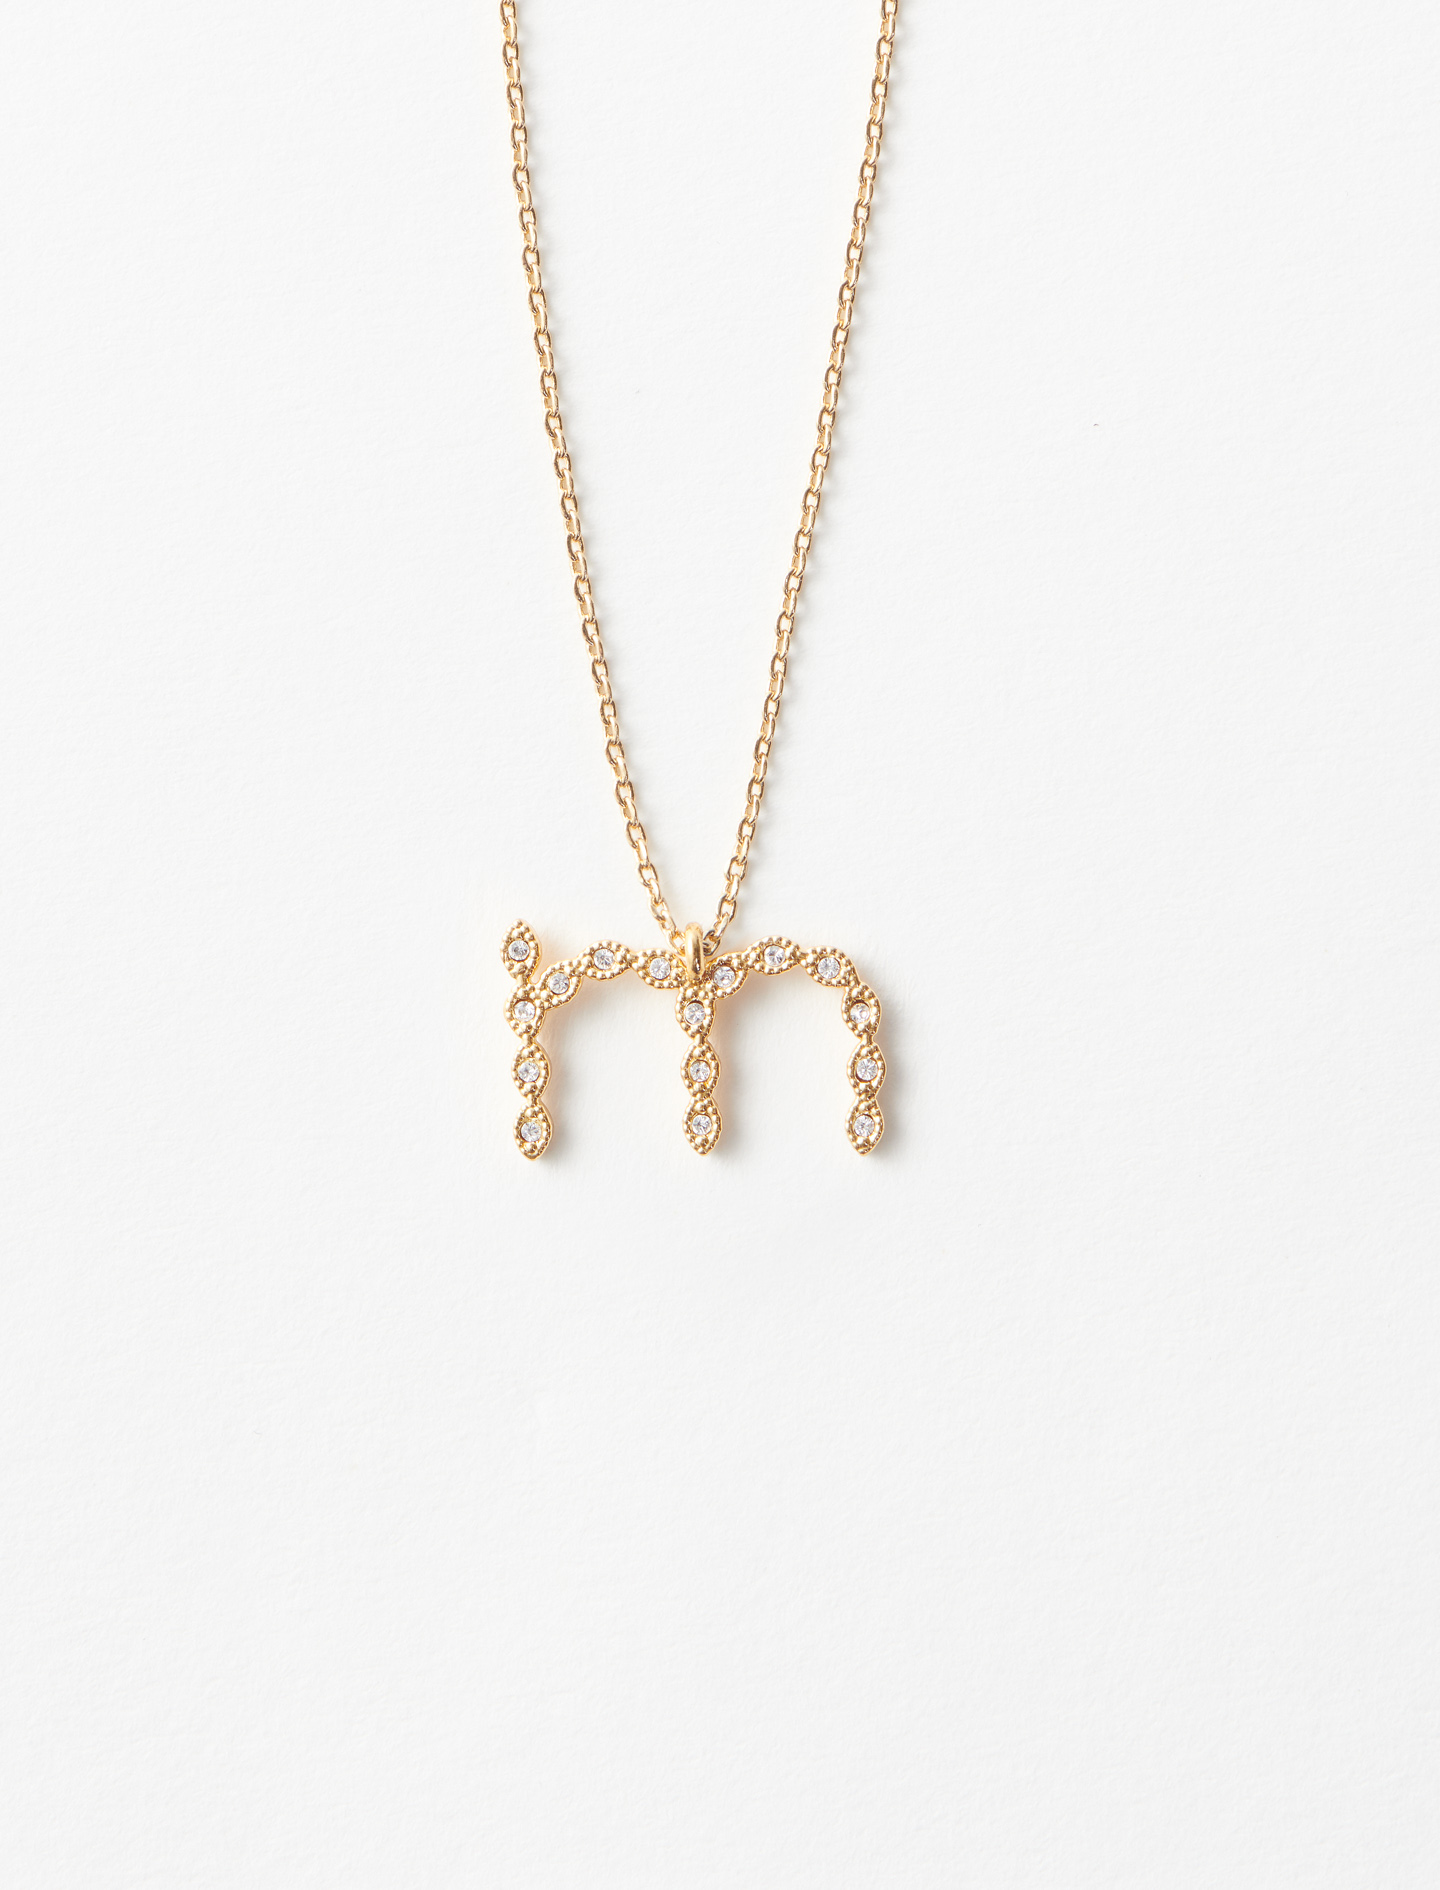 Rhinestone M necklace - Gold